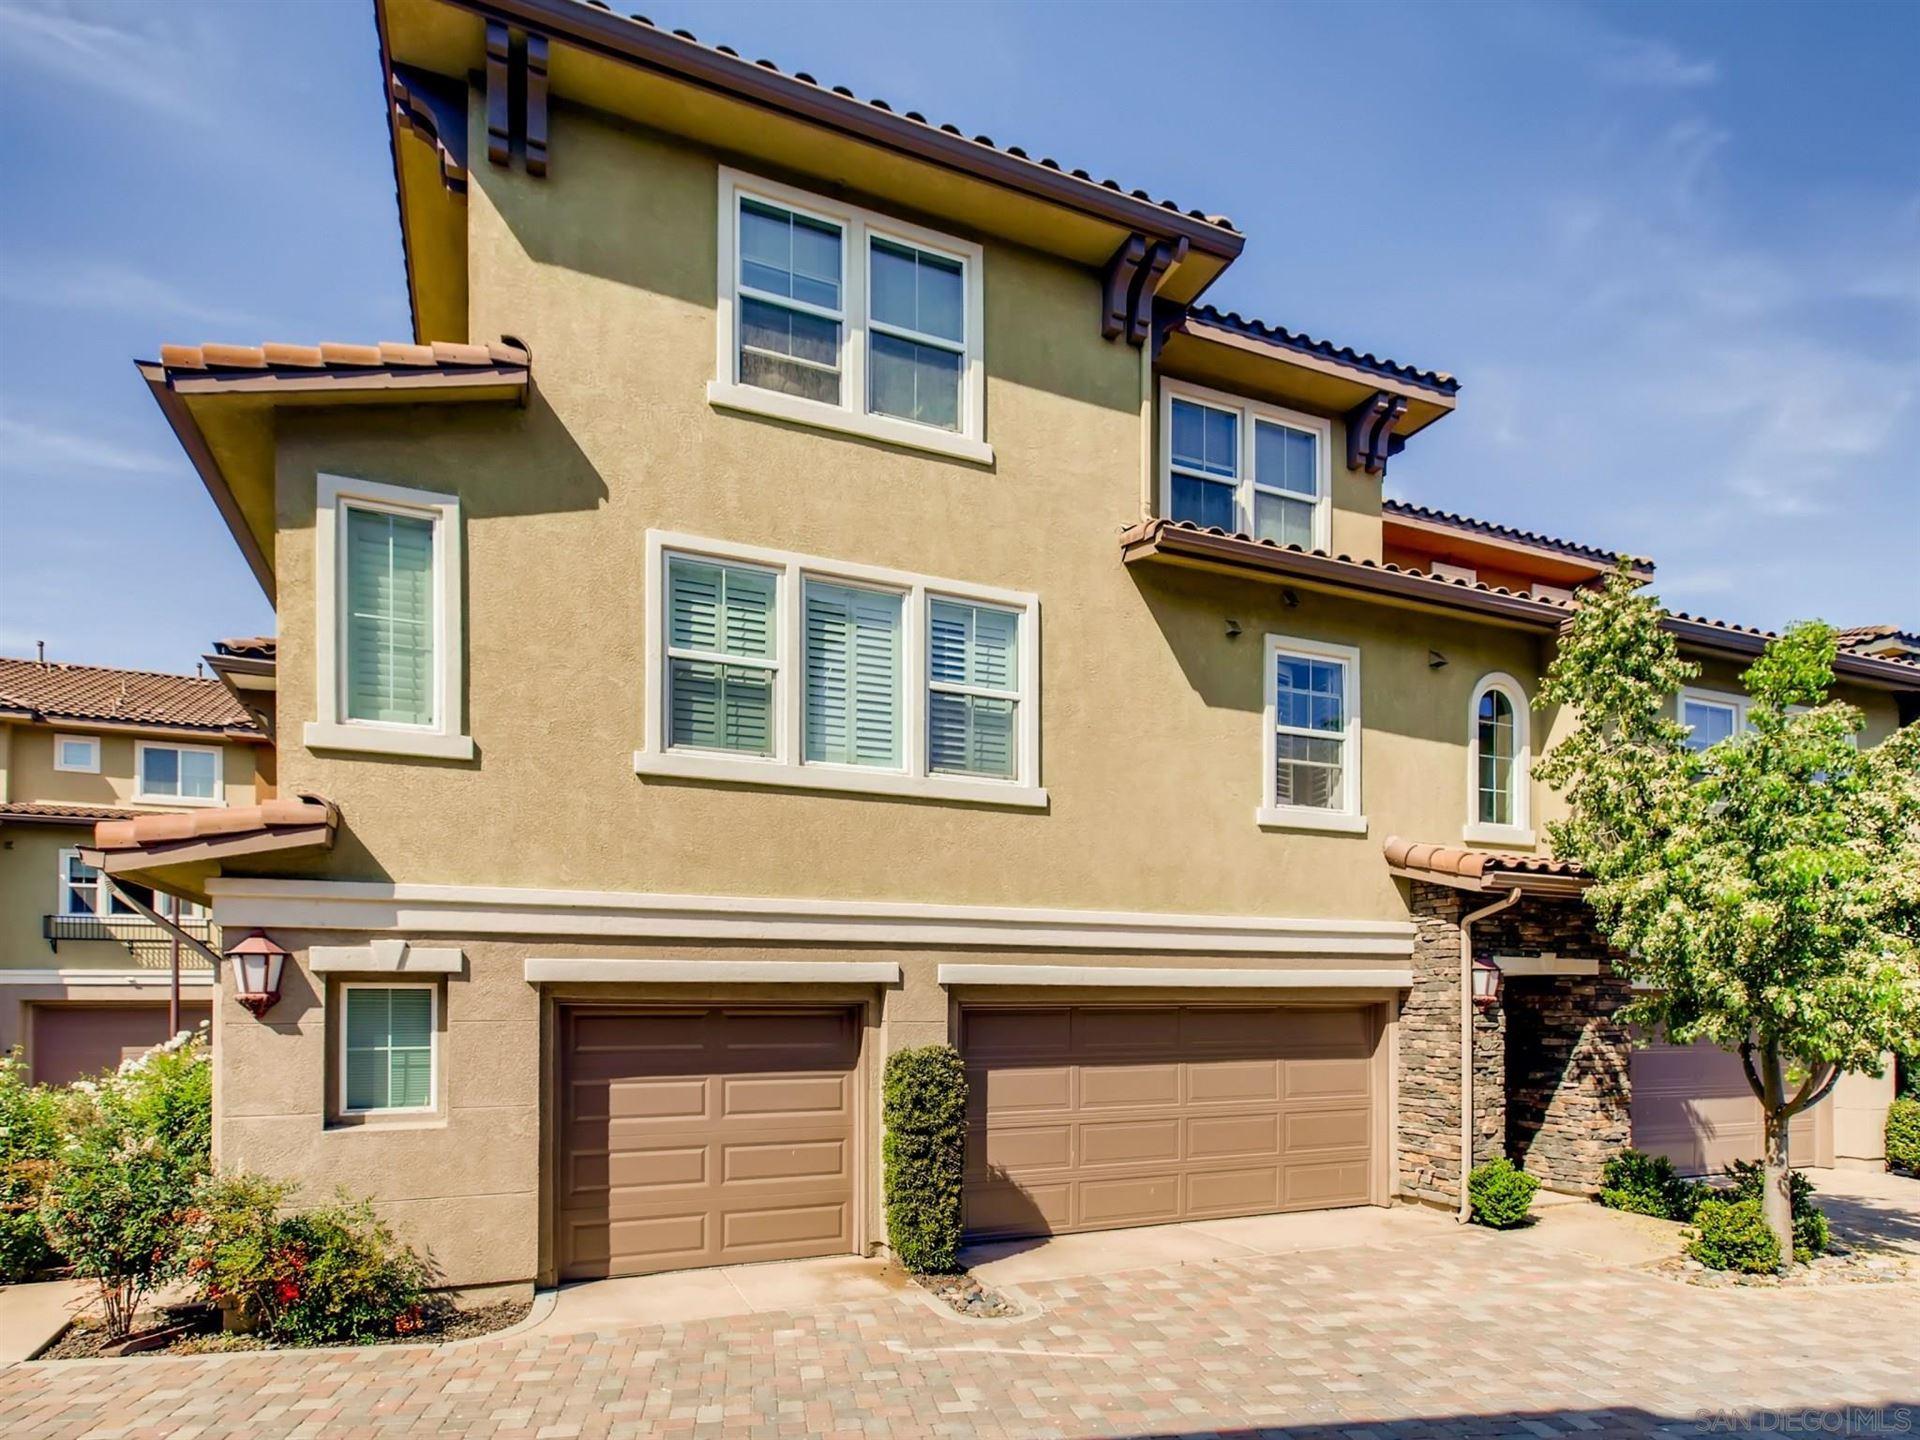 Photo of 81 Via Sovana, Santee, CA 92071 (MLS # 210016109)